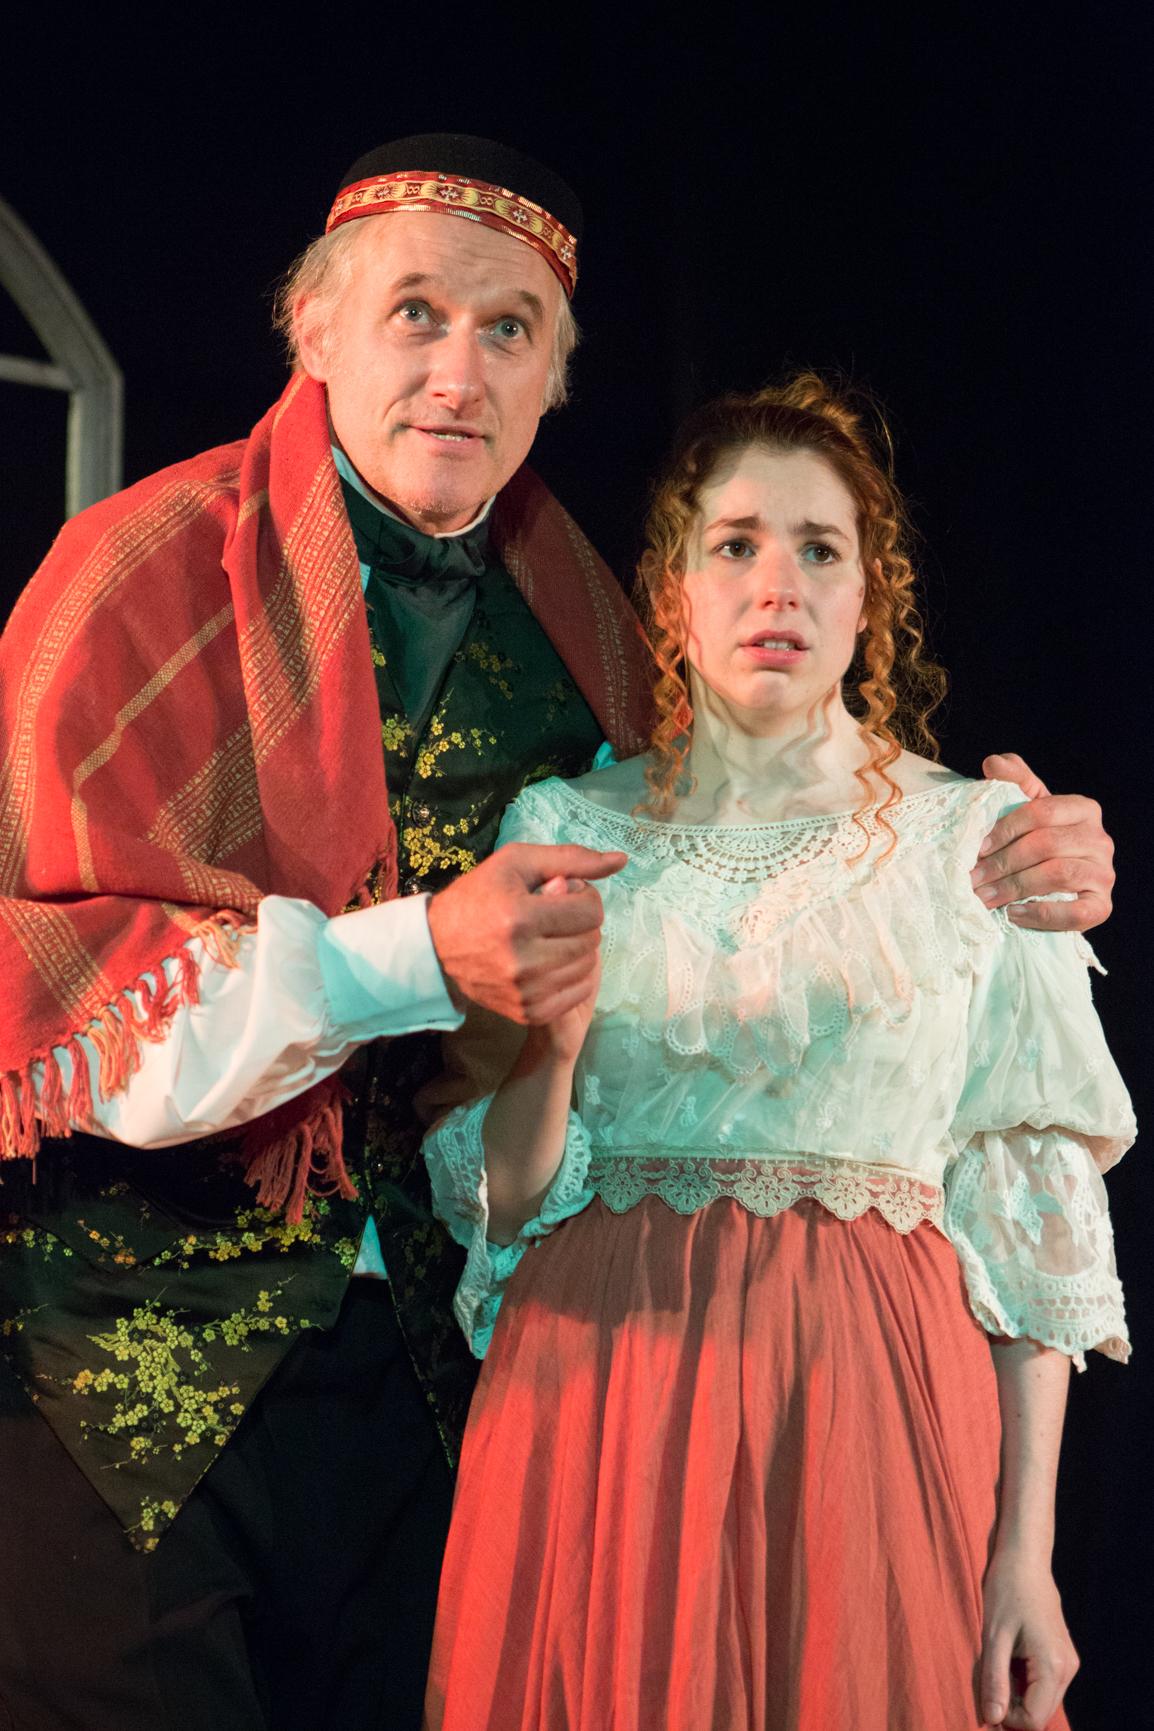 Julian Harries & Eloise Kay in THE OLD CURIOSITY SHOP